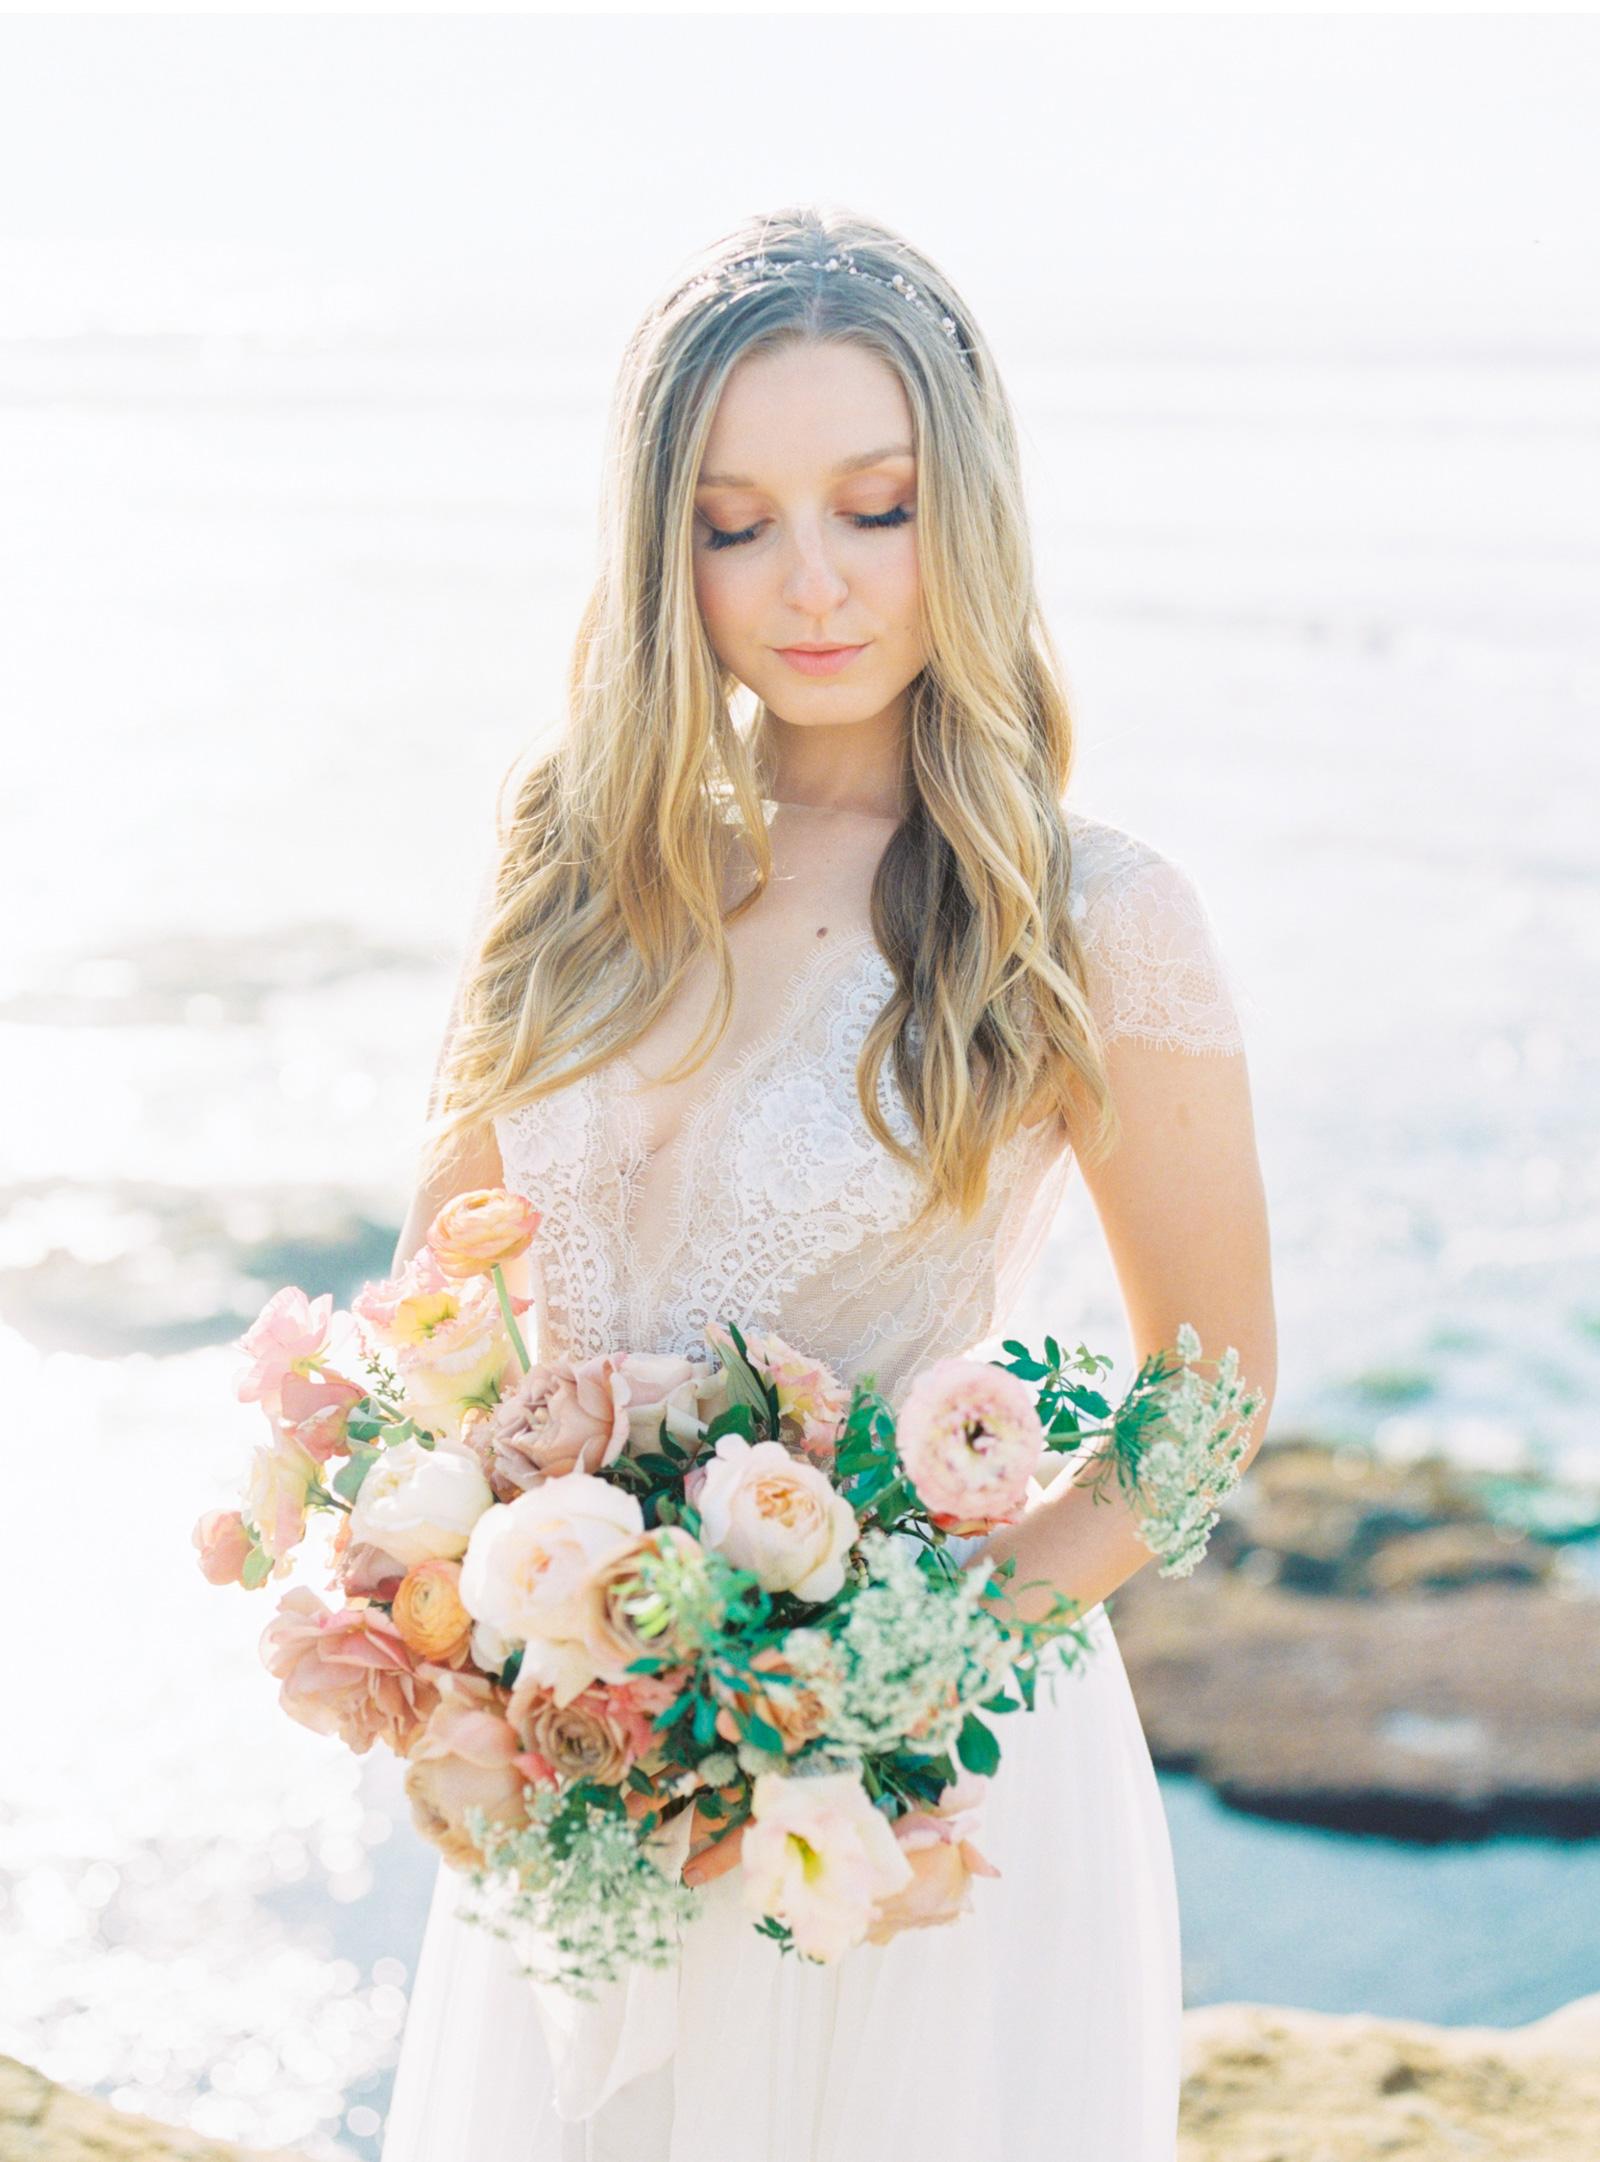 Style-Me-Pretty-California-Beach-Wedding-Natalie-Schutt-Photography_10.jpg